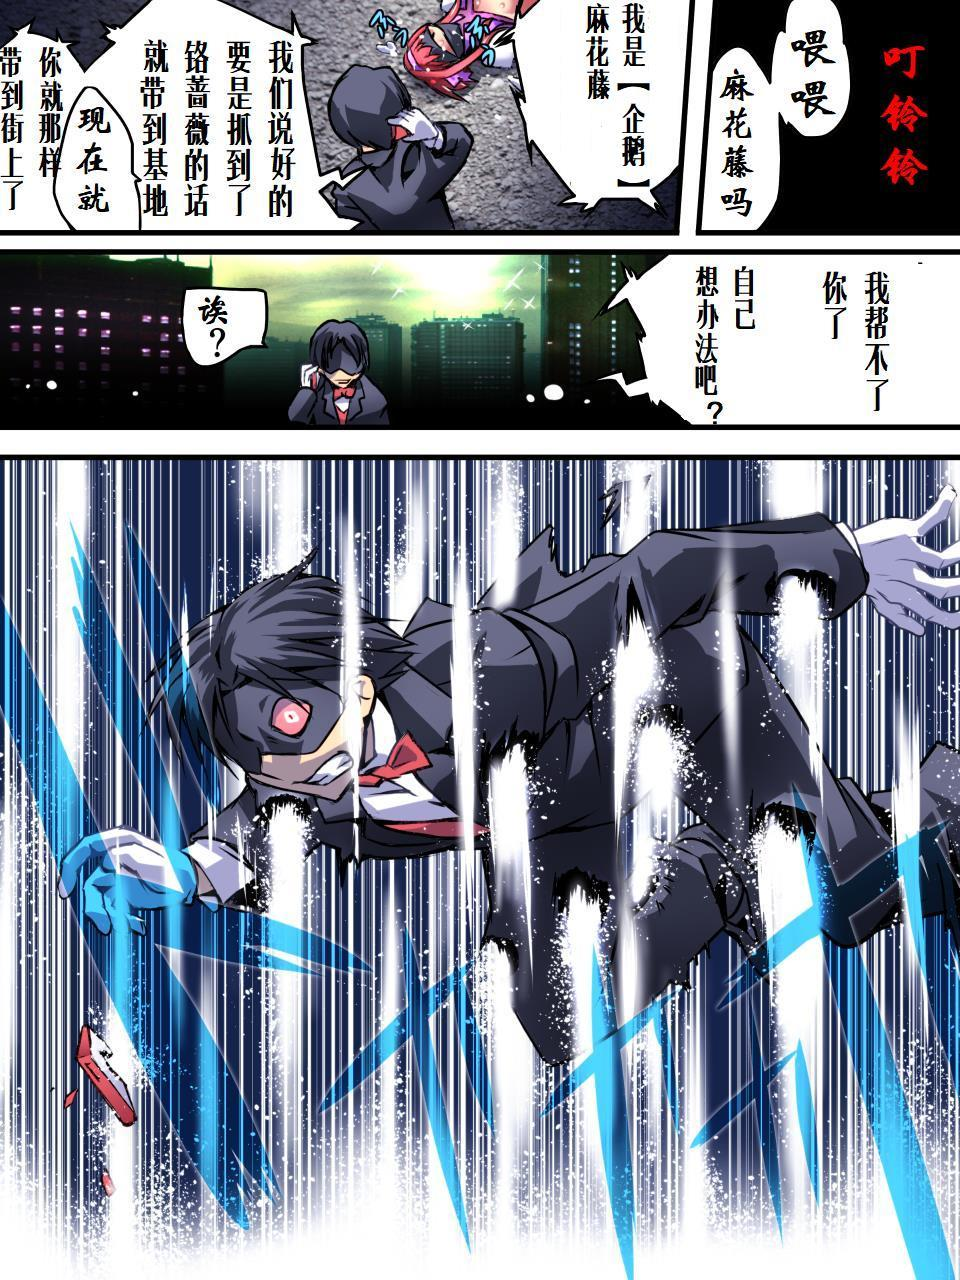 [Atelier Hachifukuan] Superheroine Yuukai Ryoujoku III - Superheroine in Distress [Chrome Rose Bell]   凌辱诱拐3 [Chinese] [有条色狼汉化] 30